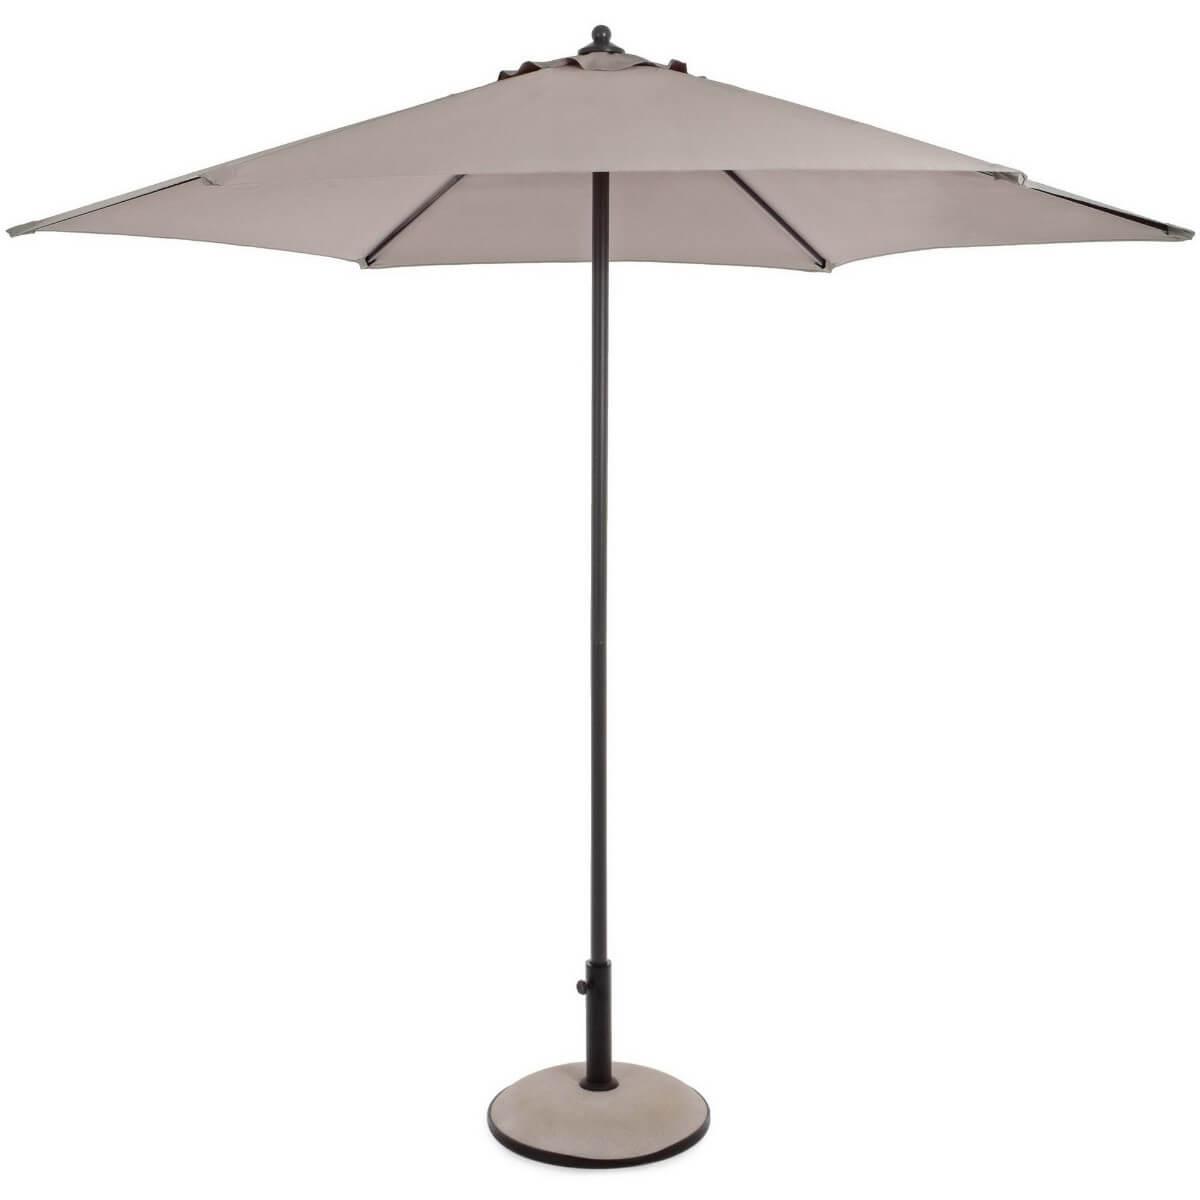 Зонт 4villa Верона 270 см серый